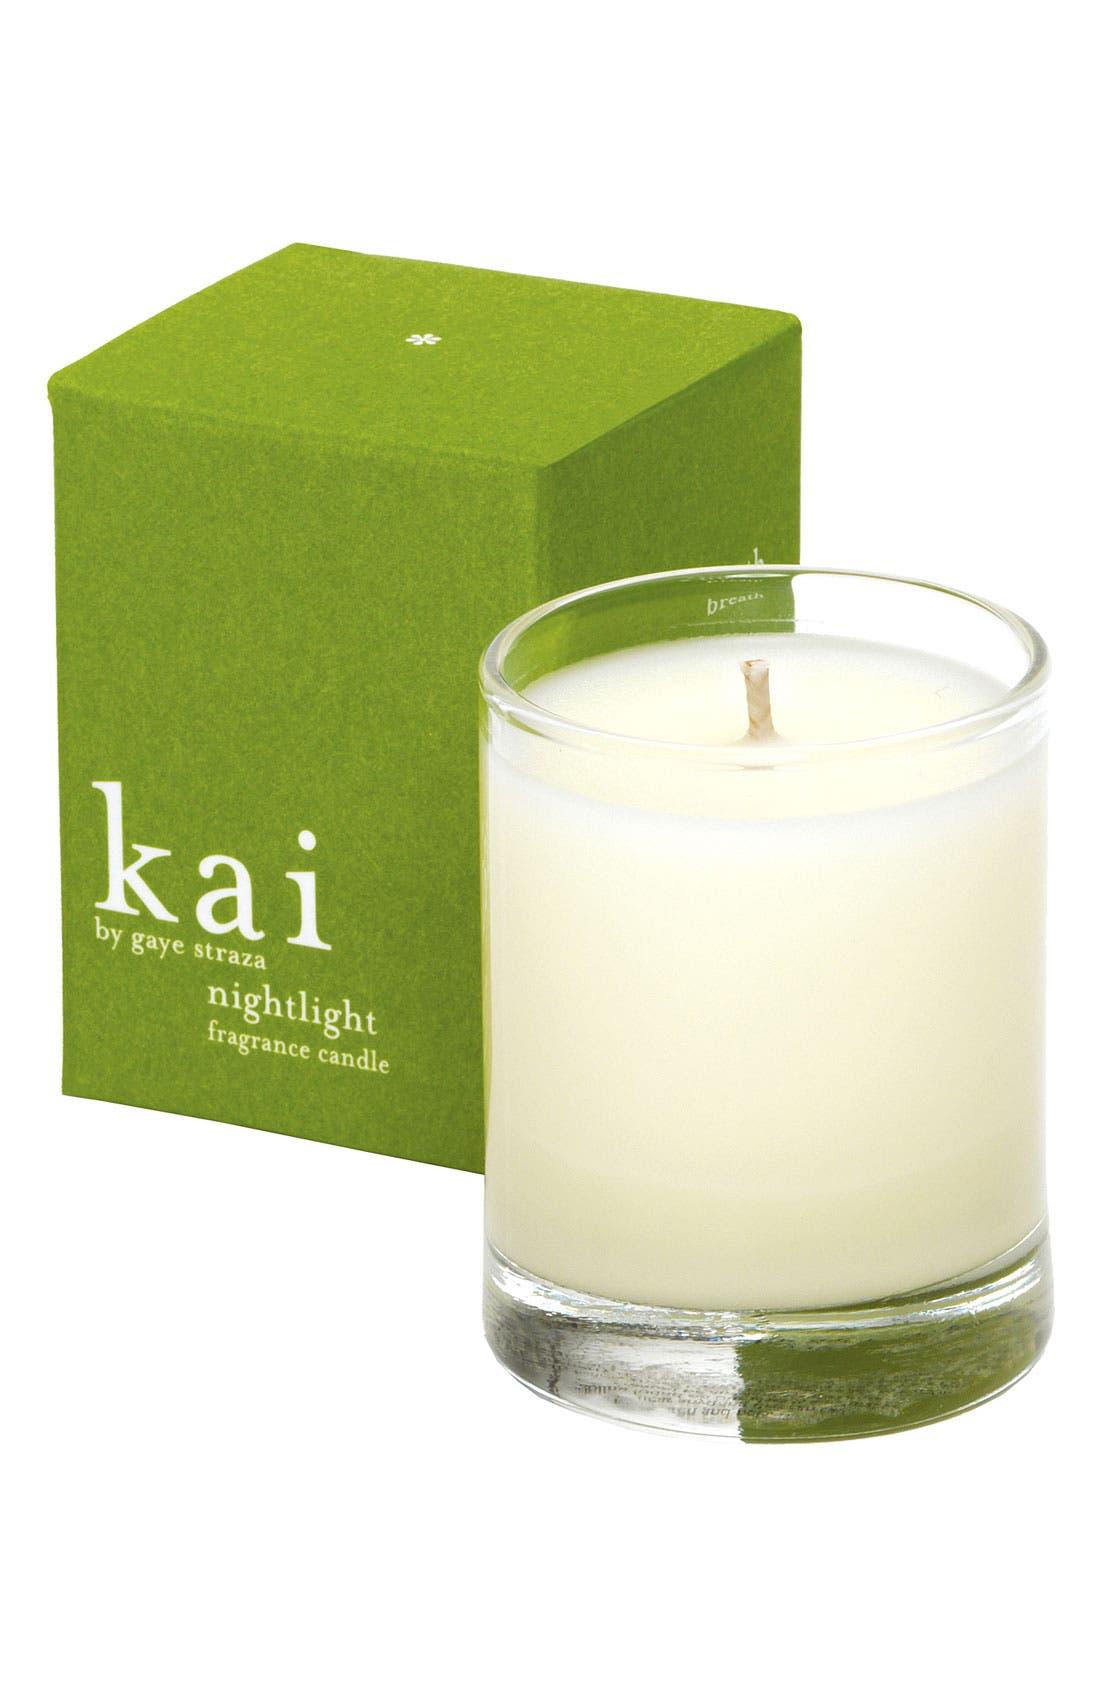 'Nightlight' Fragrance Candle,                         Main,                         color, NO COLOR